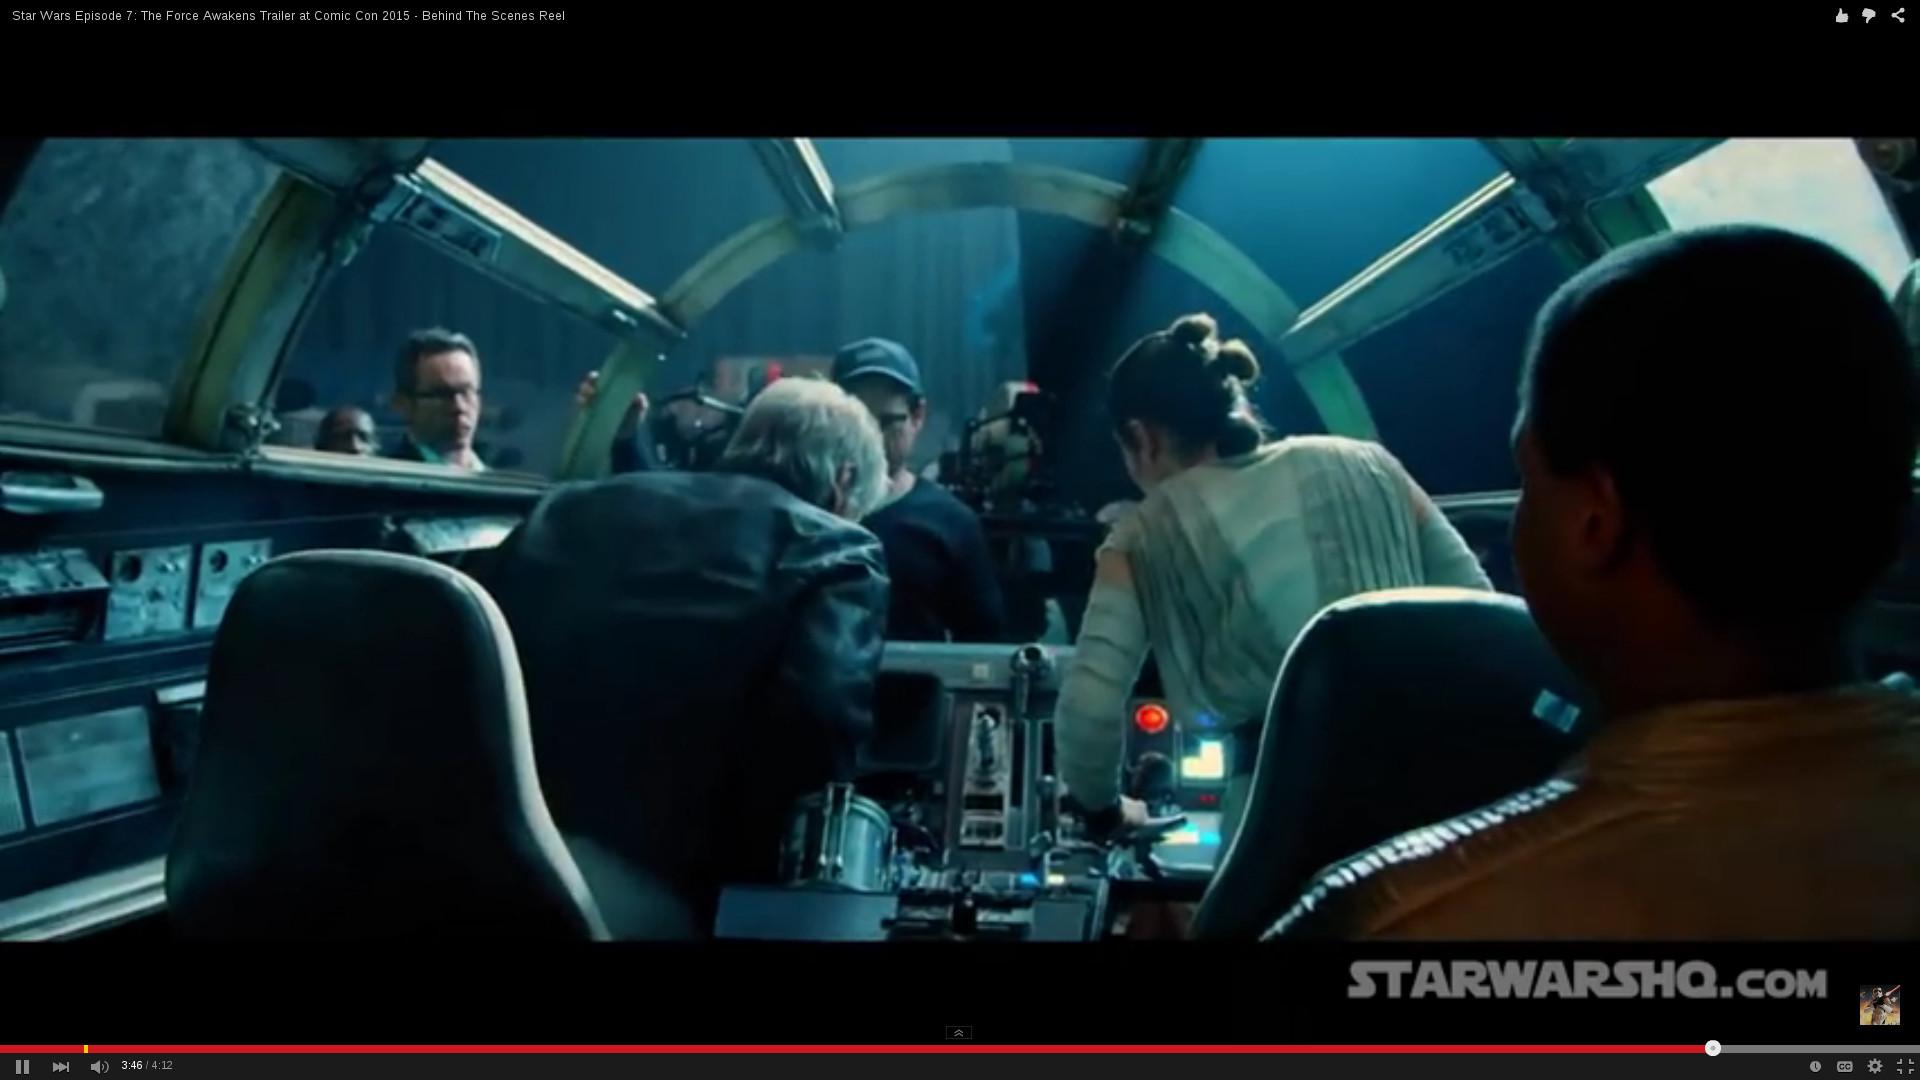 Inside the cockpit of the Millenium Falcon.